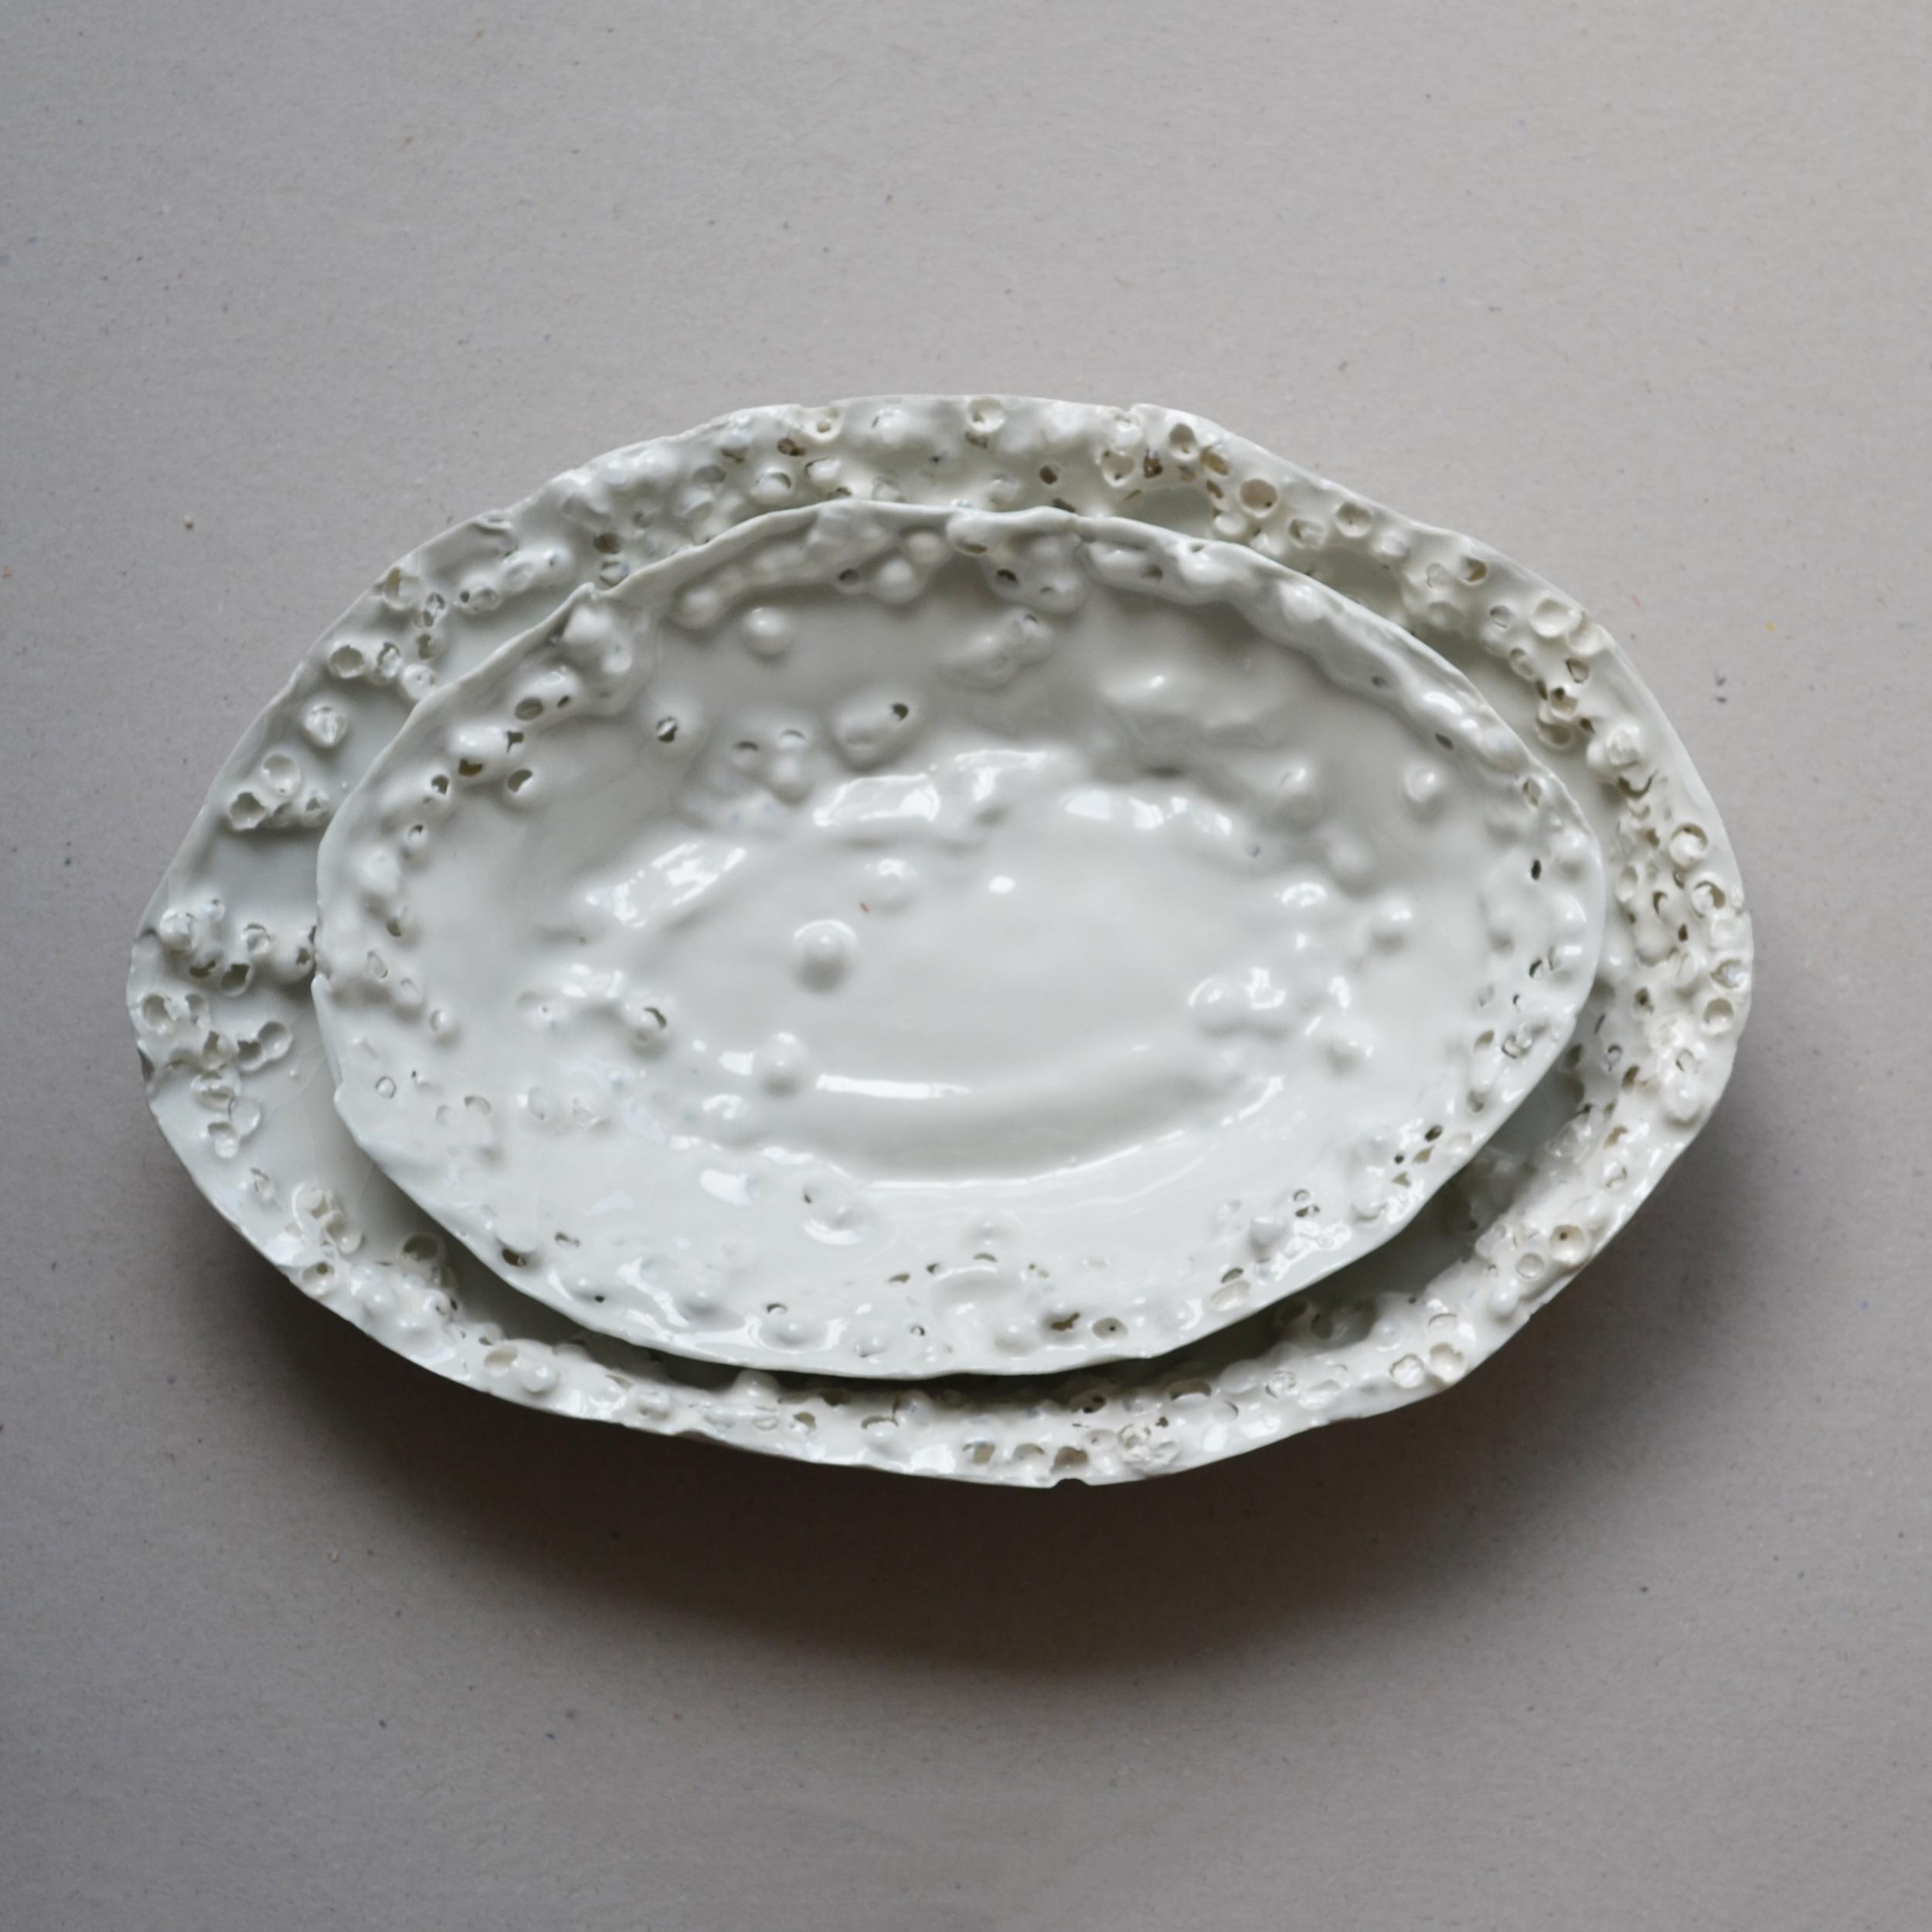 Platter Size L 41 cm x W 31 cm x H 7 cm and L x W x H